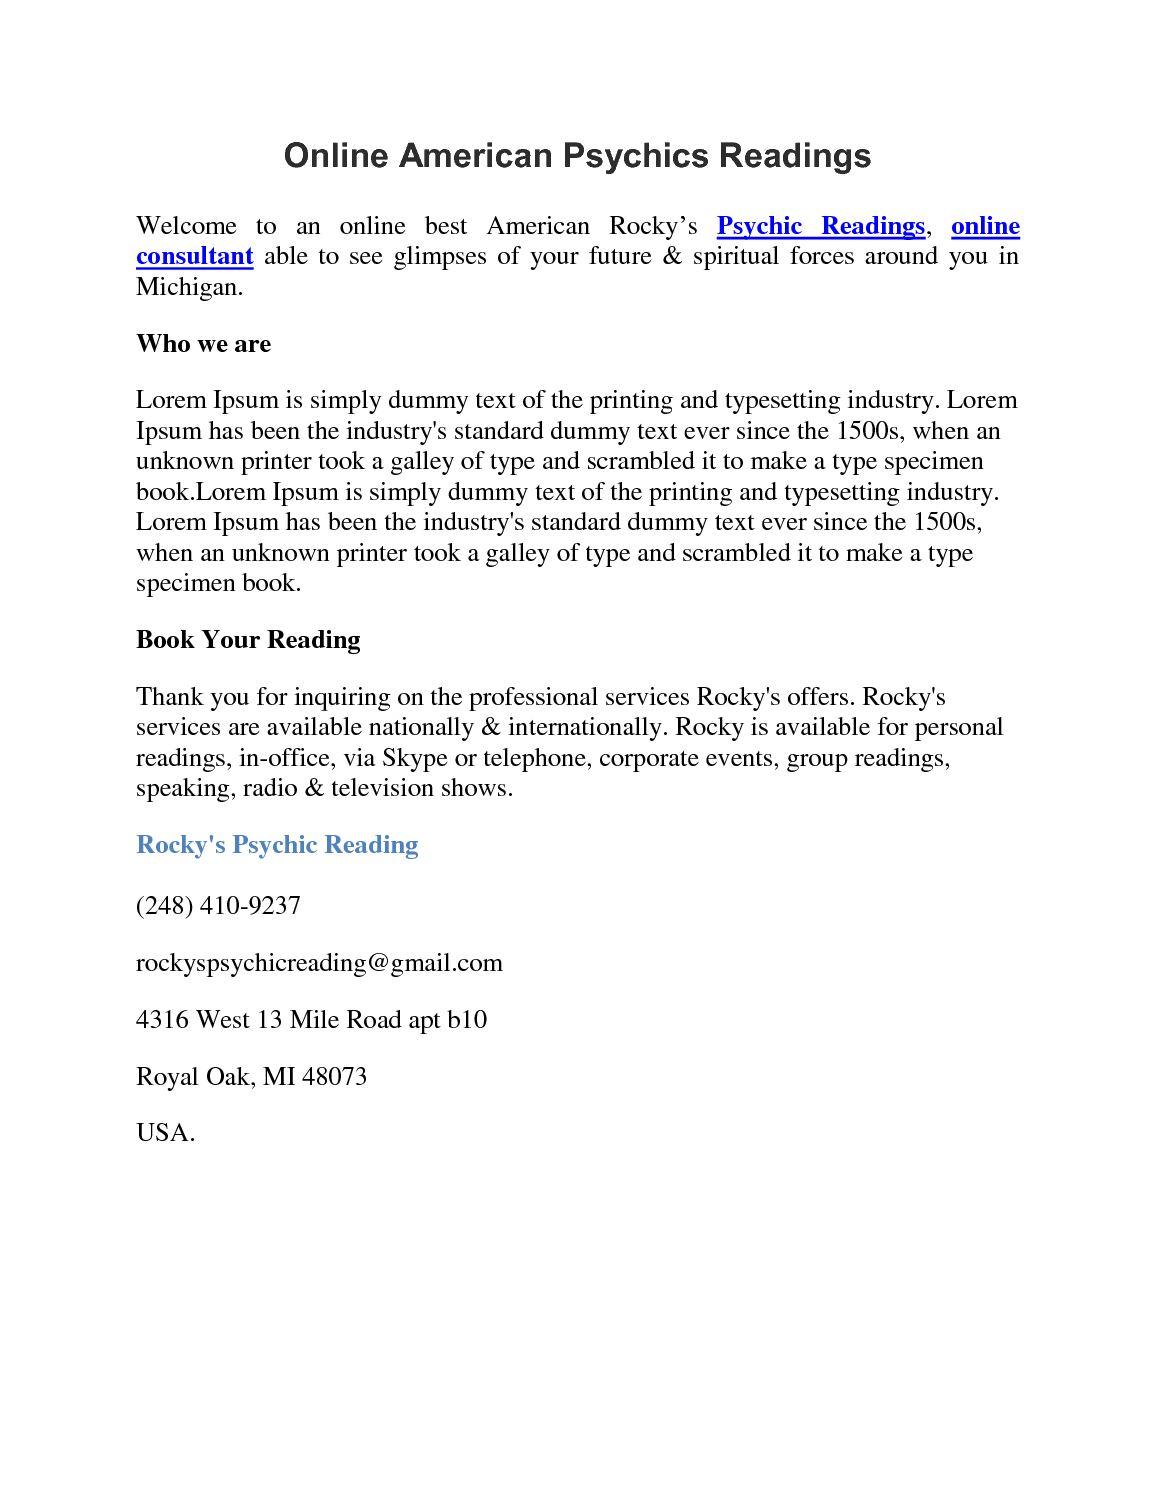 Calaméo - Online American Psychics Readings